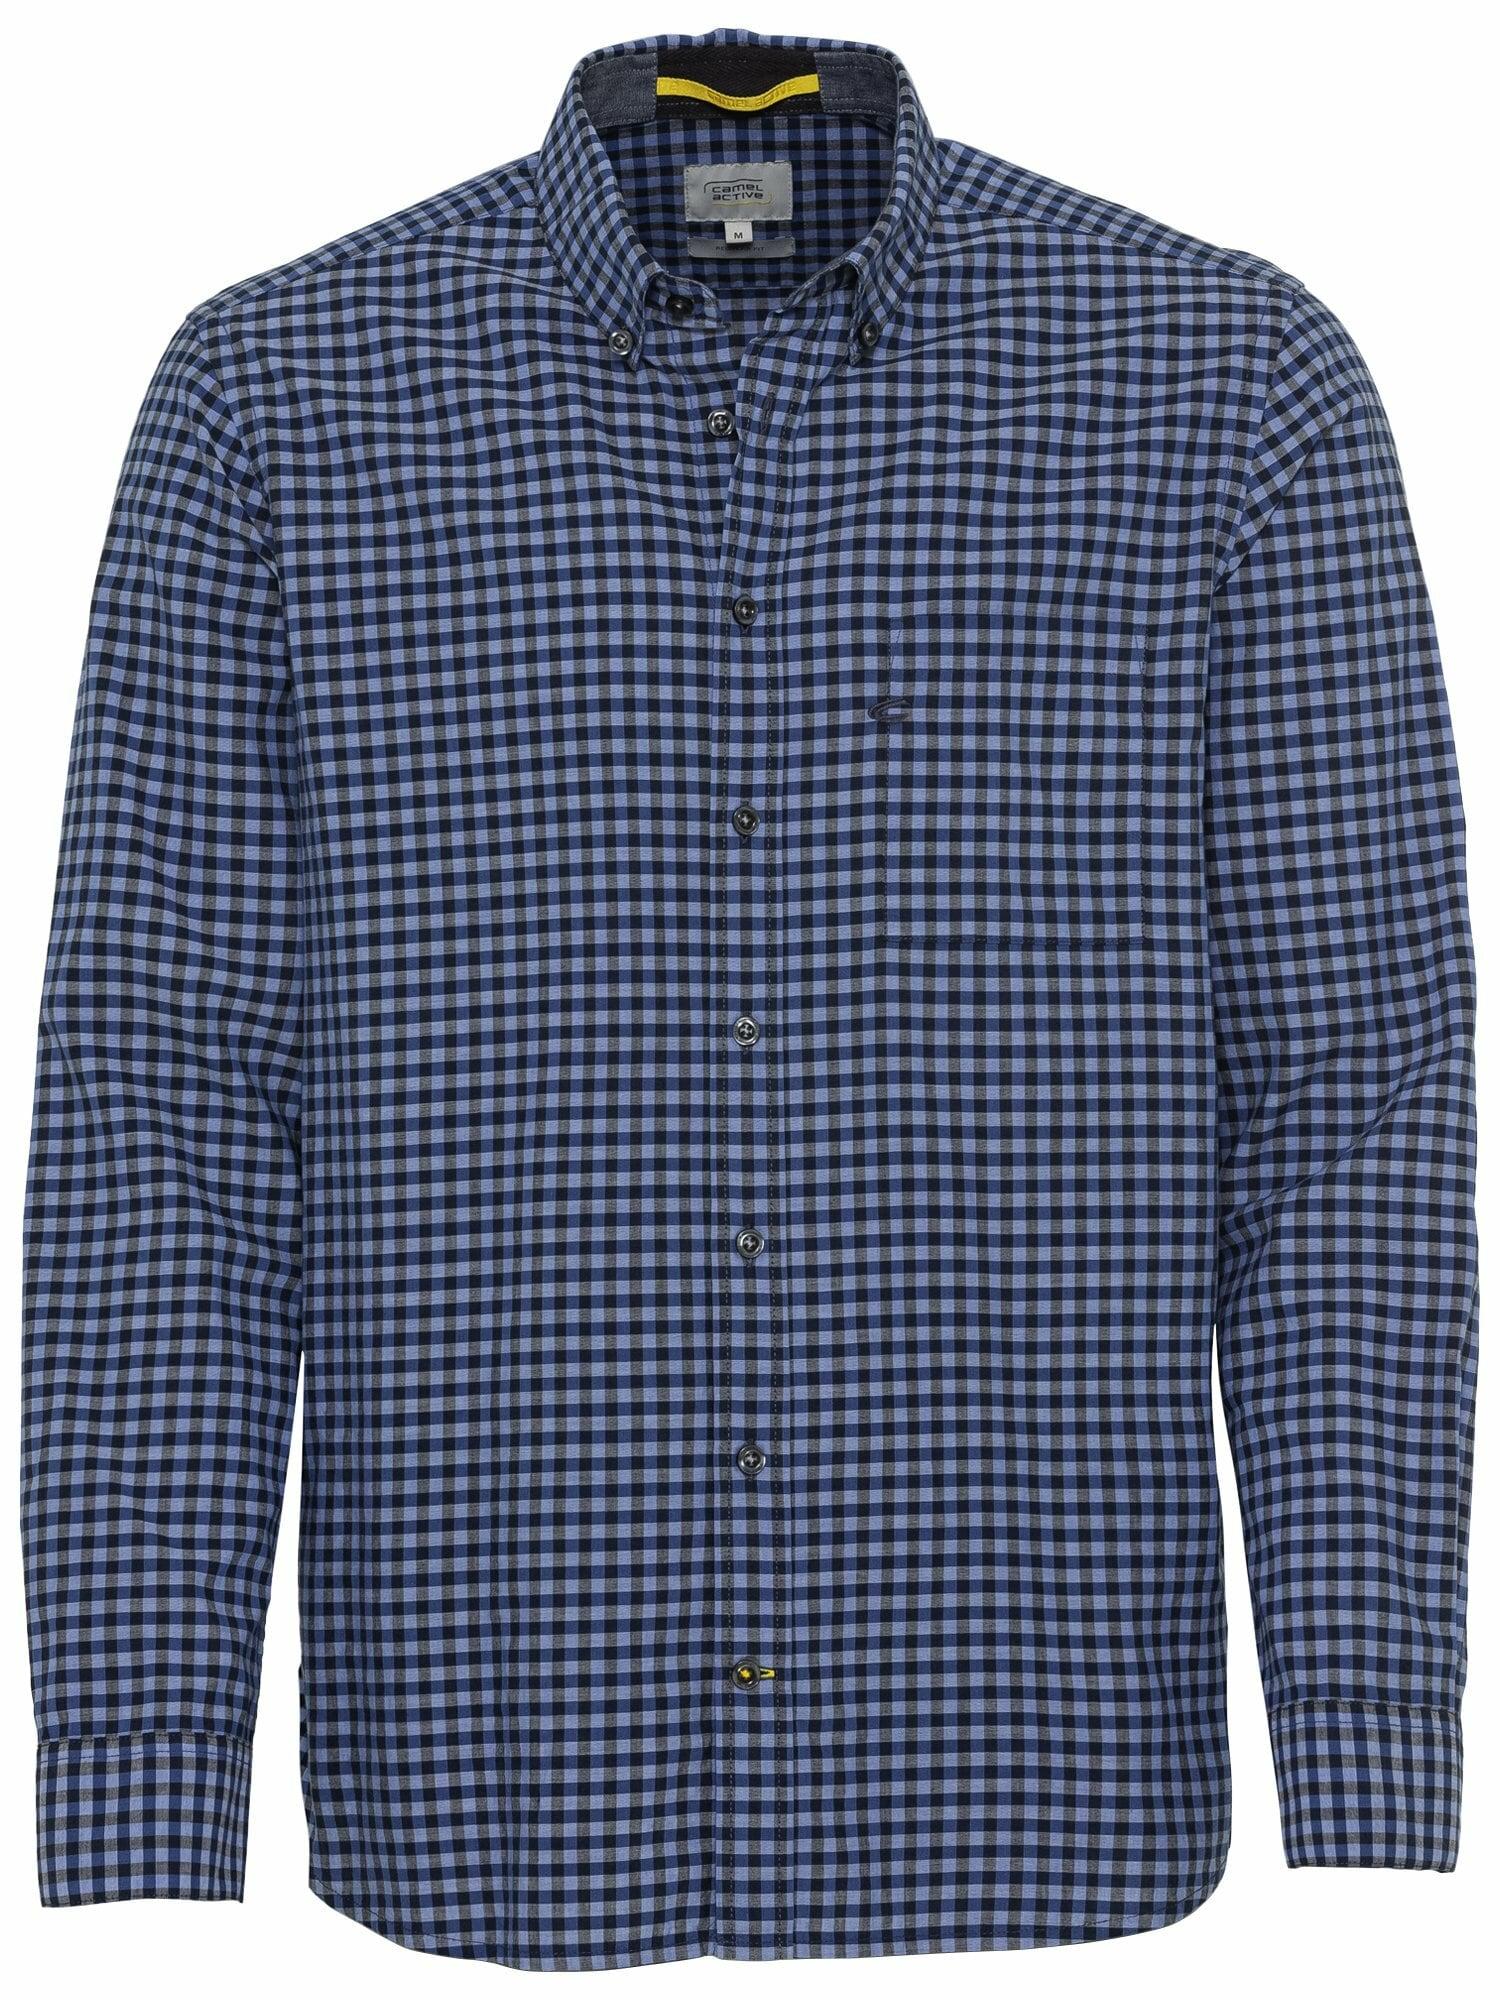 CAMEL ACTIVE Marškiniai mėlyna / tamsiai mėlyna